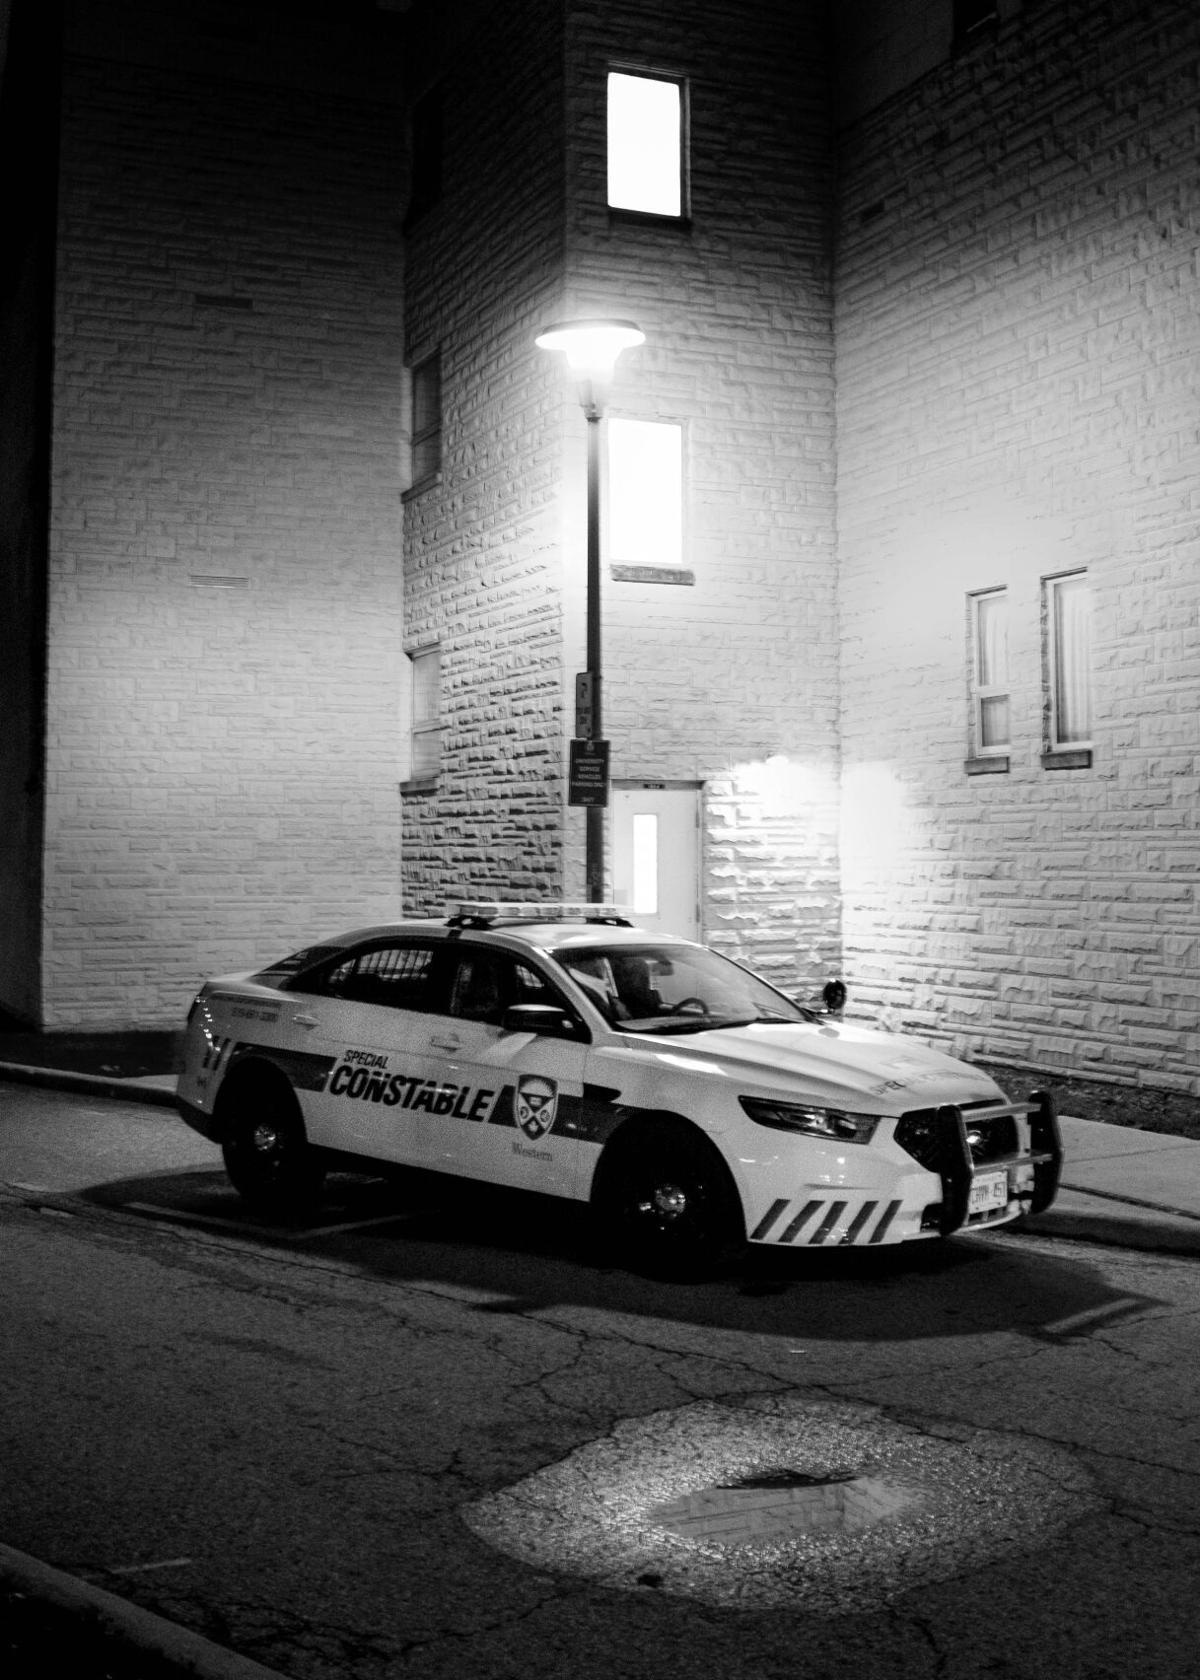 Med-Syd Assaults - Campus Police Car